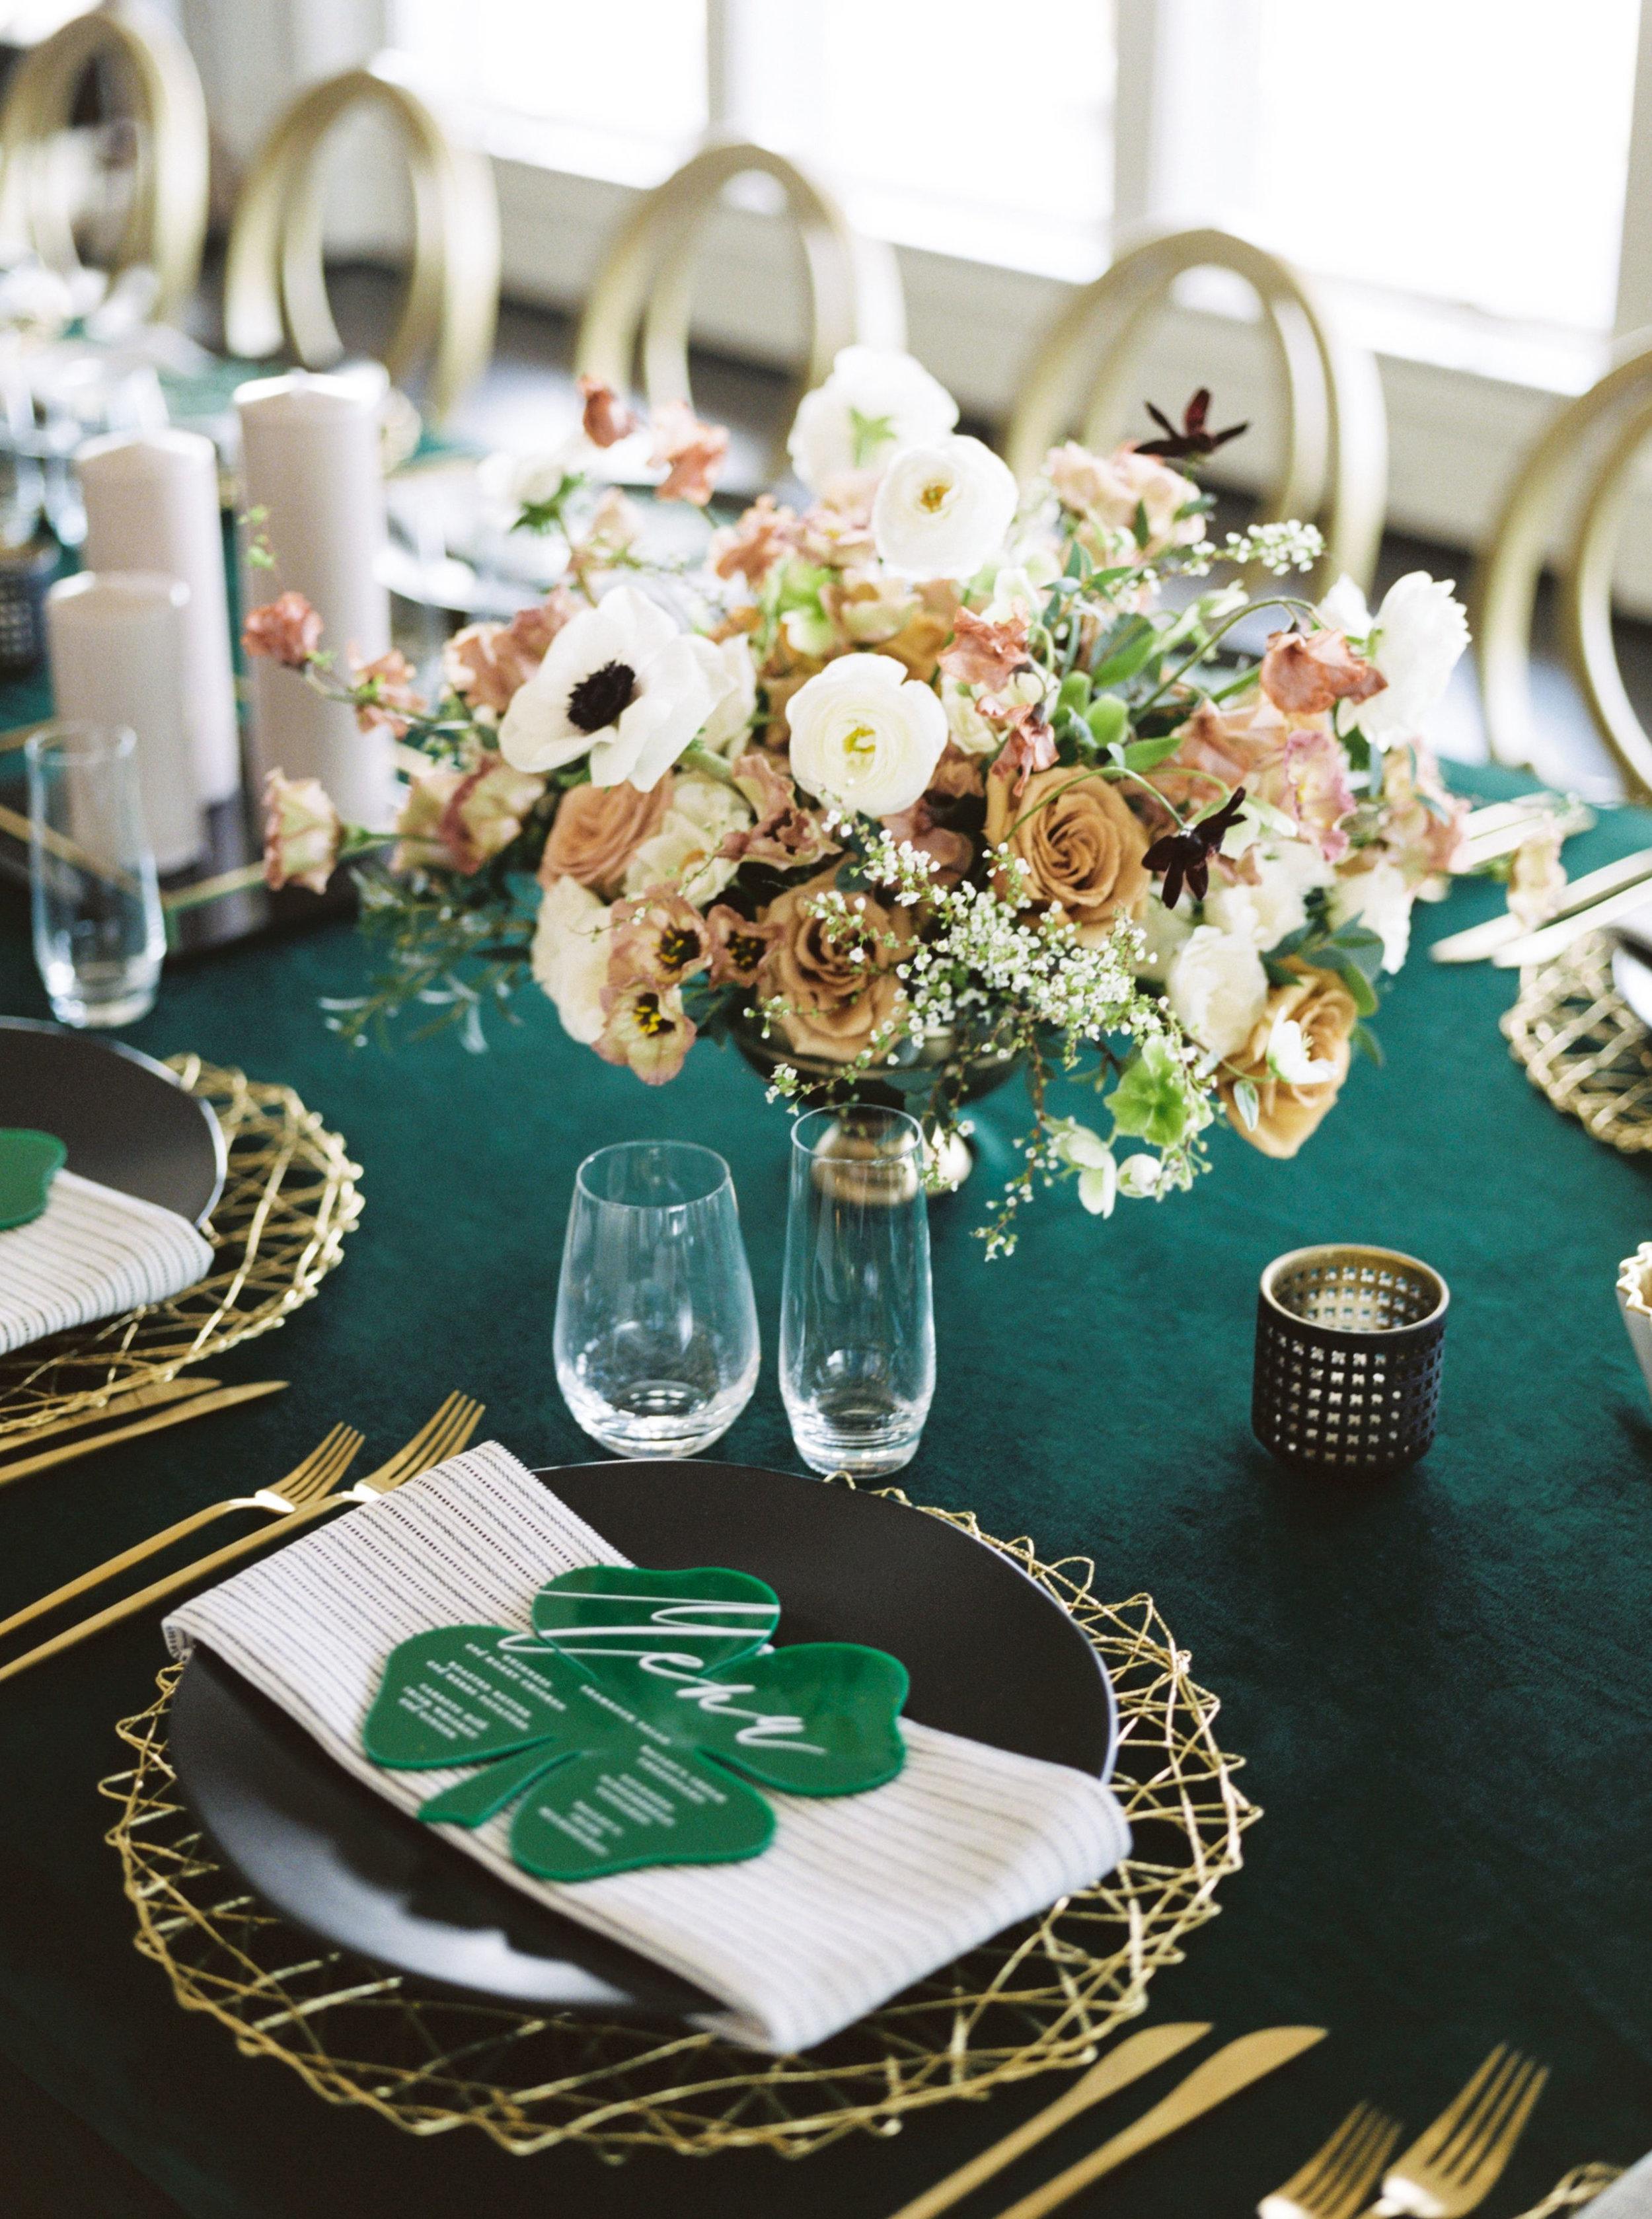 Courtney Inghram Fine Art Virginia Wedding Floral Designer